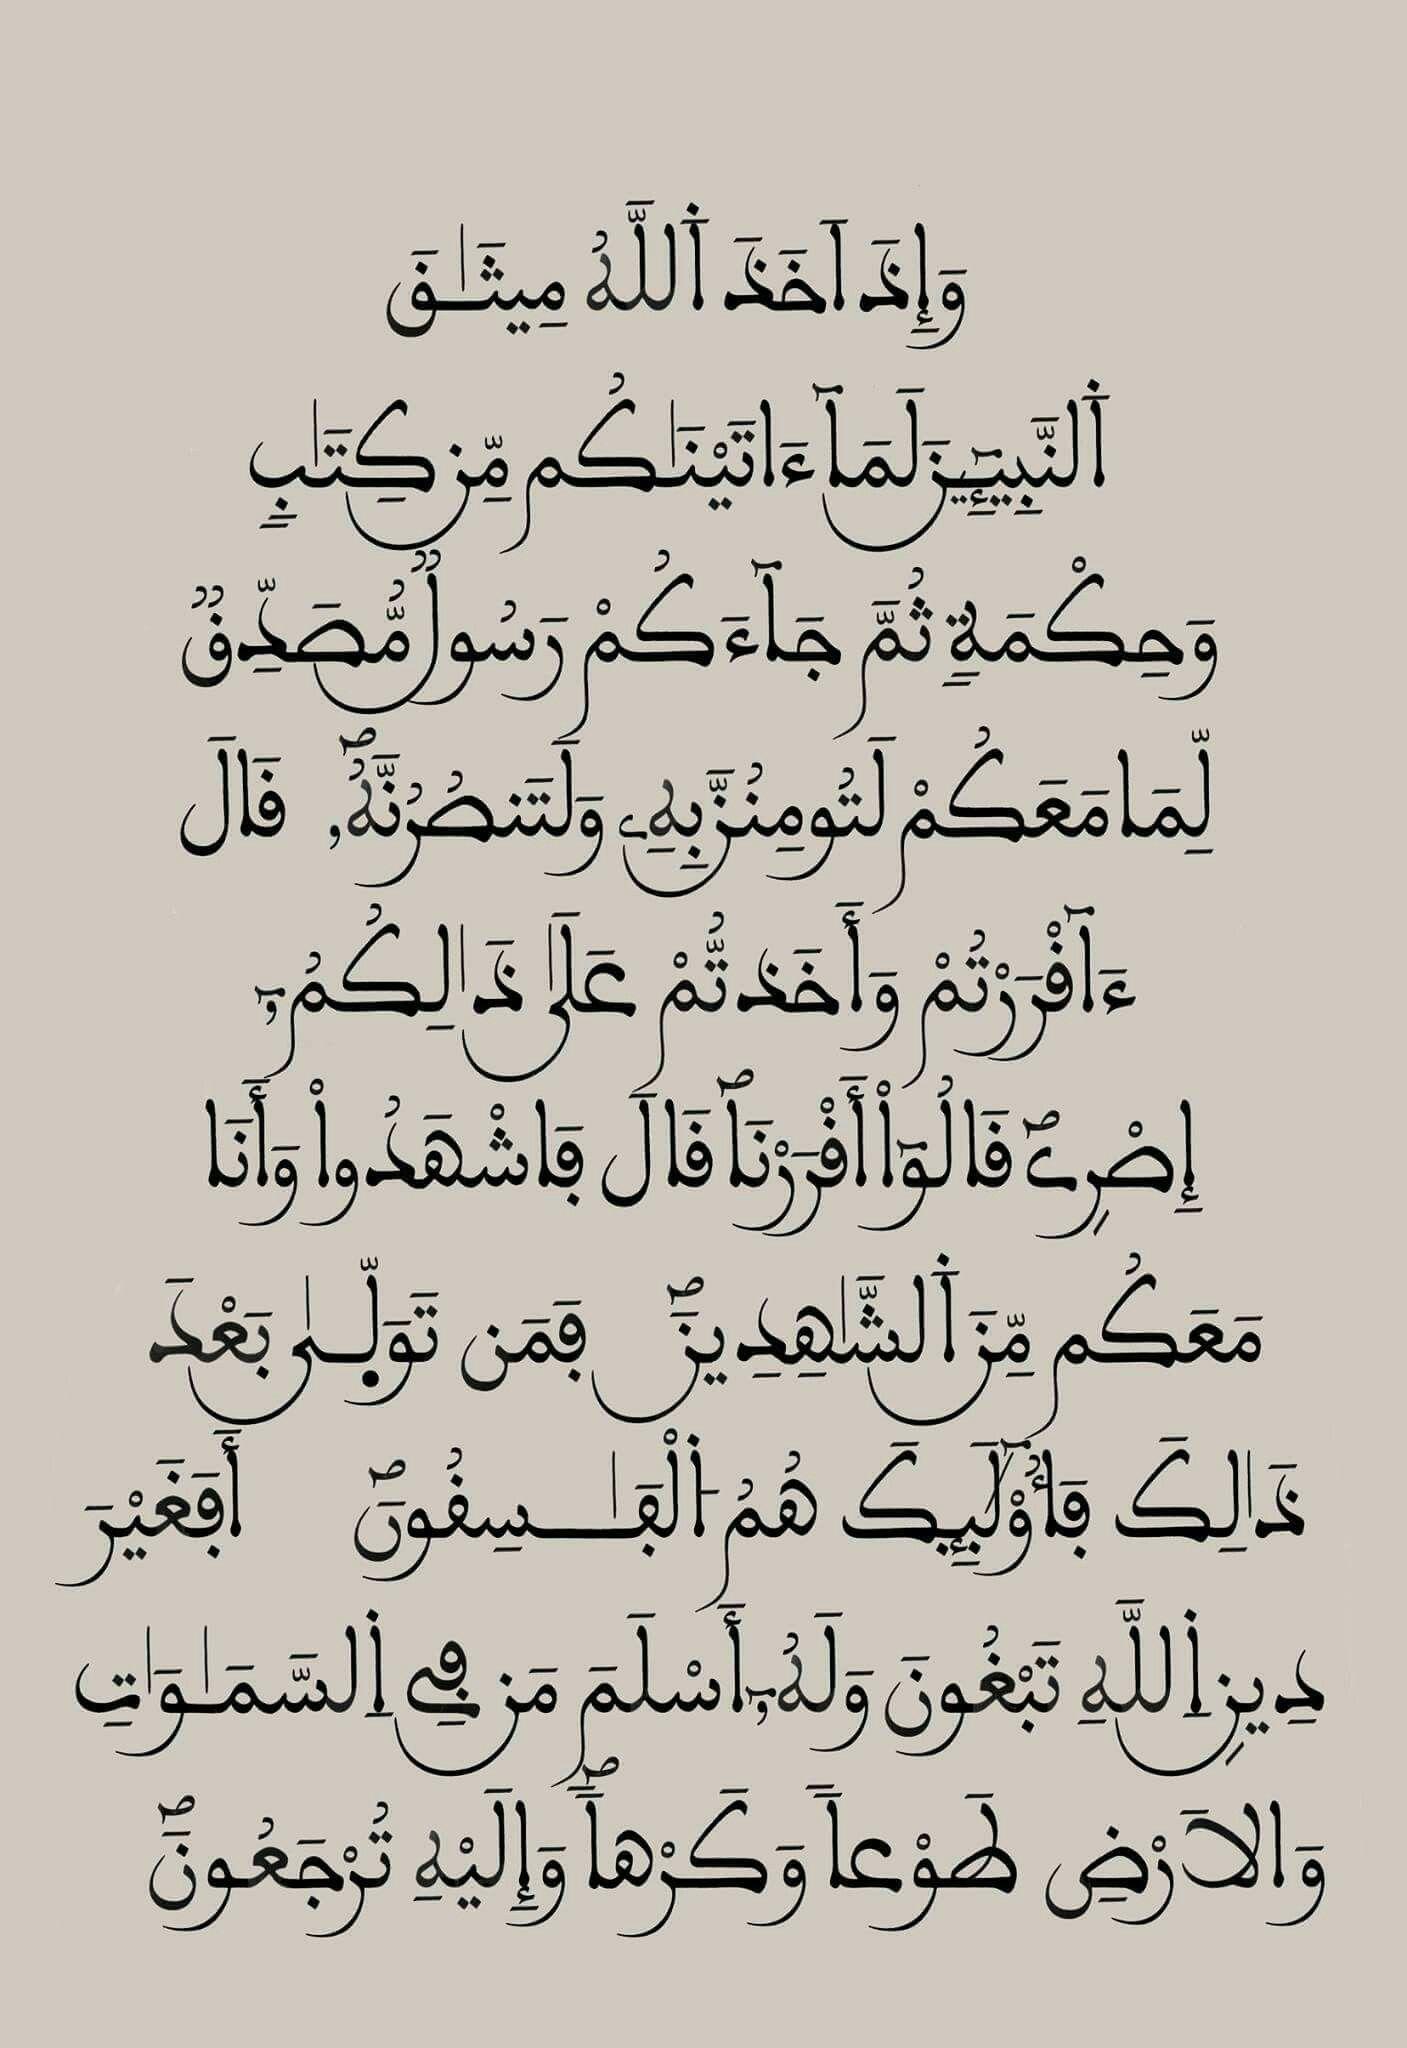 Pin By كتابا متشابها On فن الخط العربى Islamic Calligraphy Islamic Art Calligraphy Islamic Calligraphy Painting